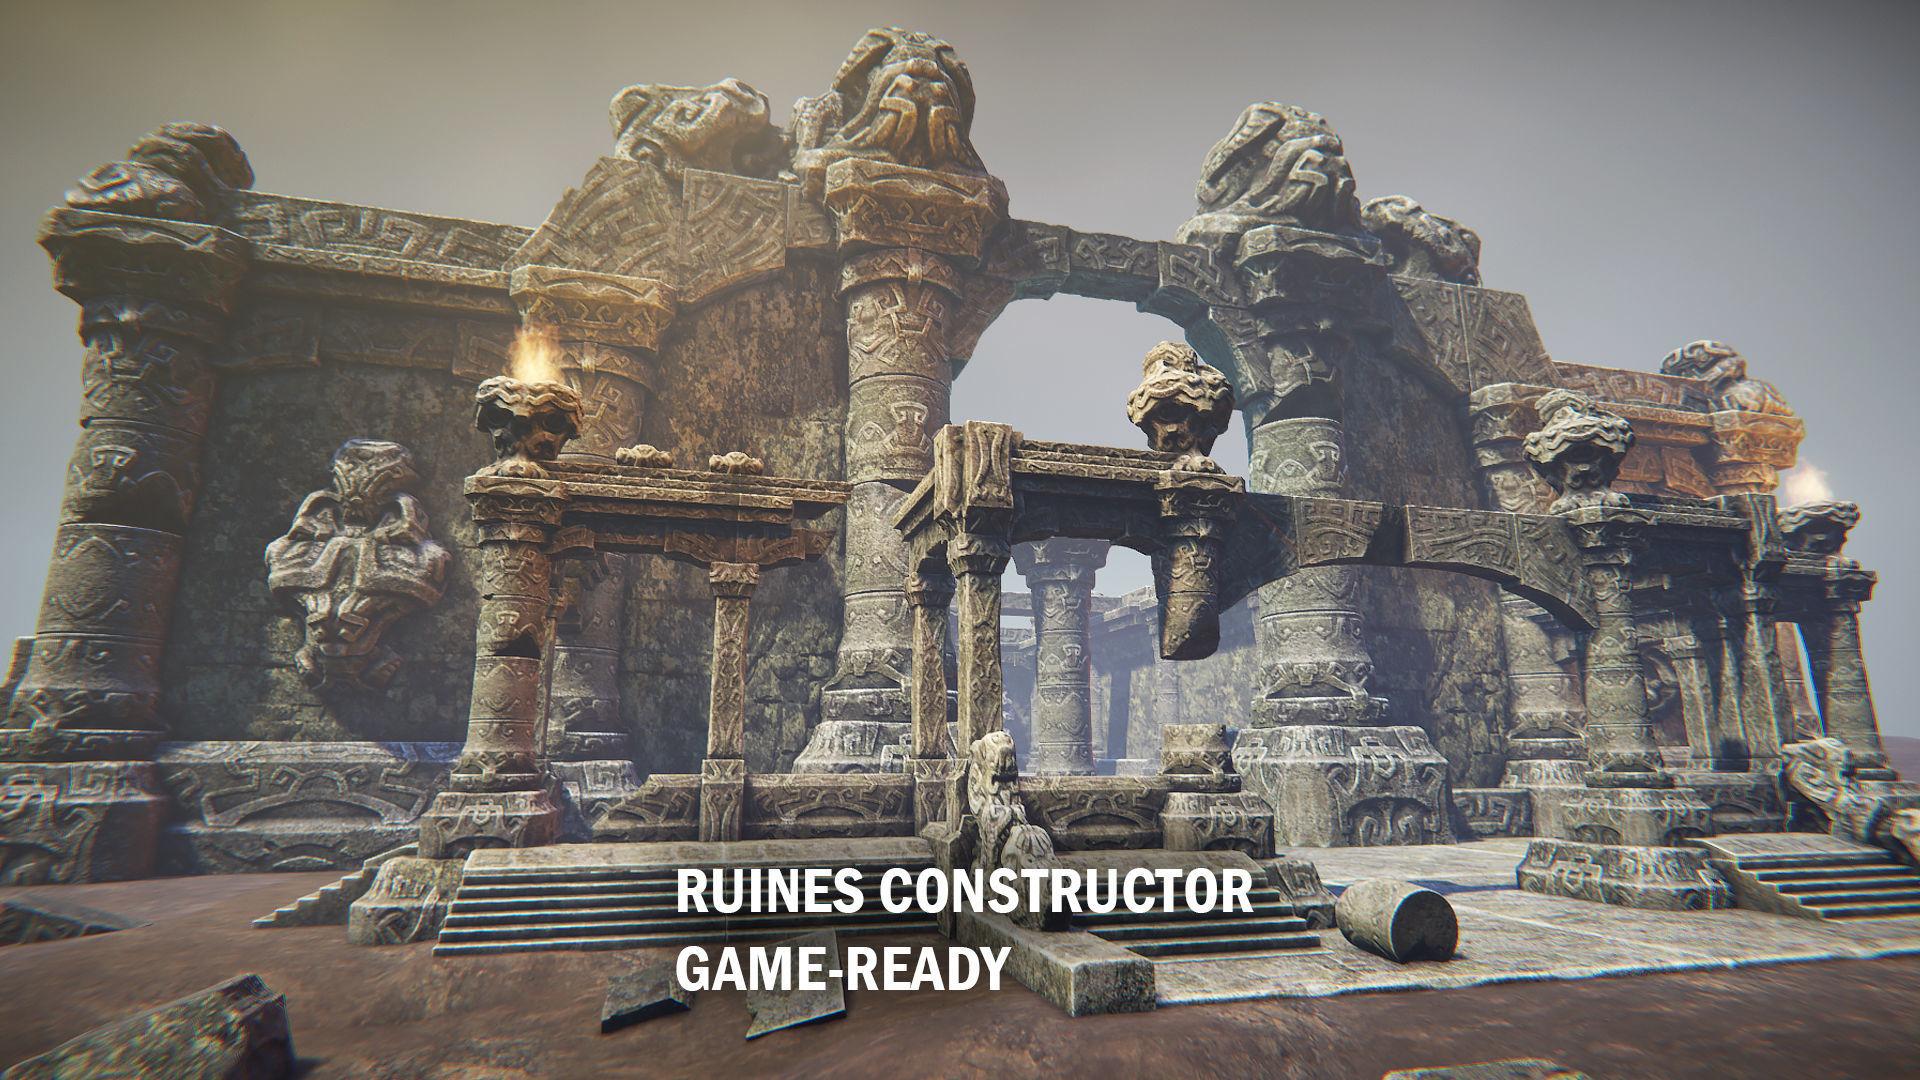 Ruins constructor